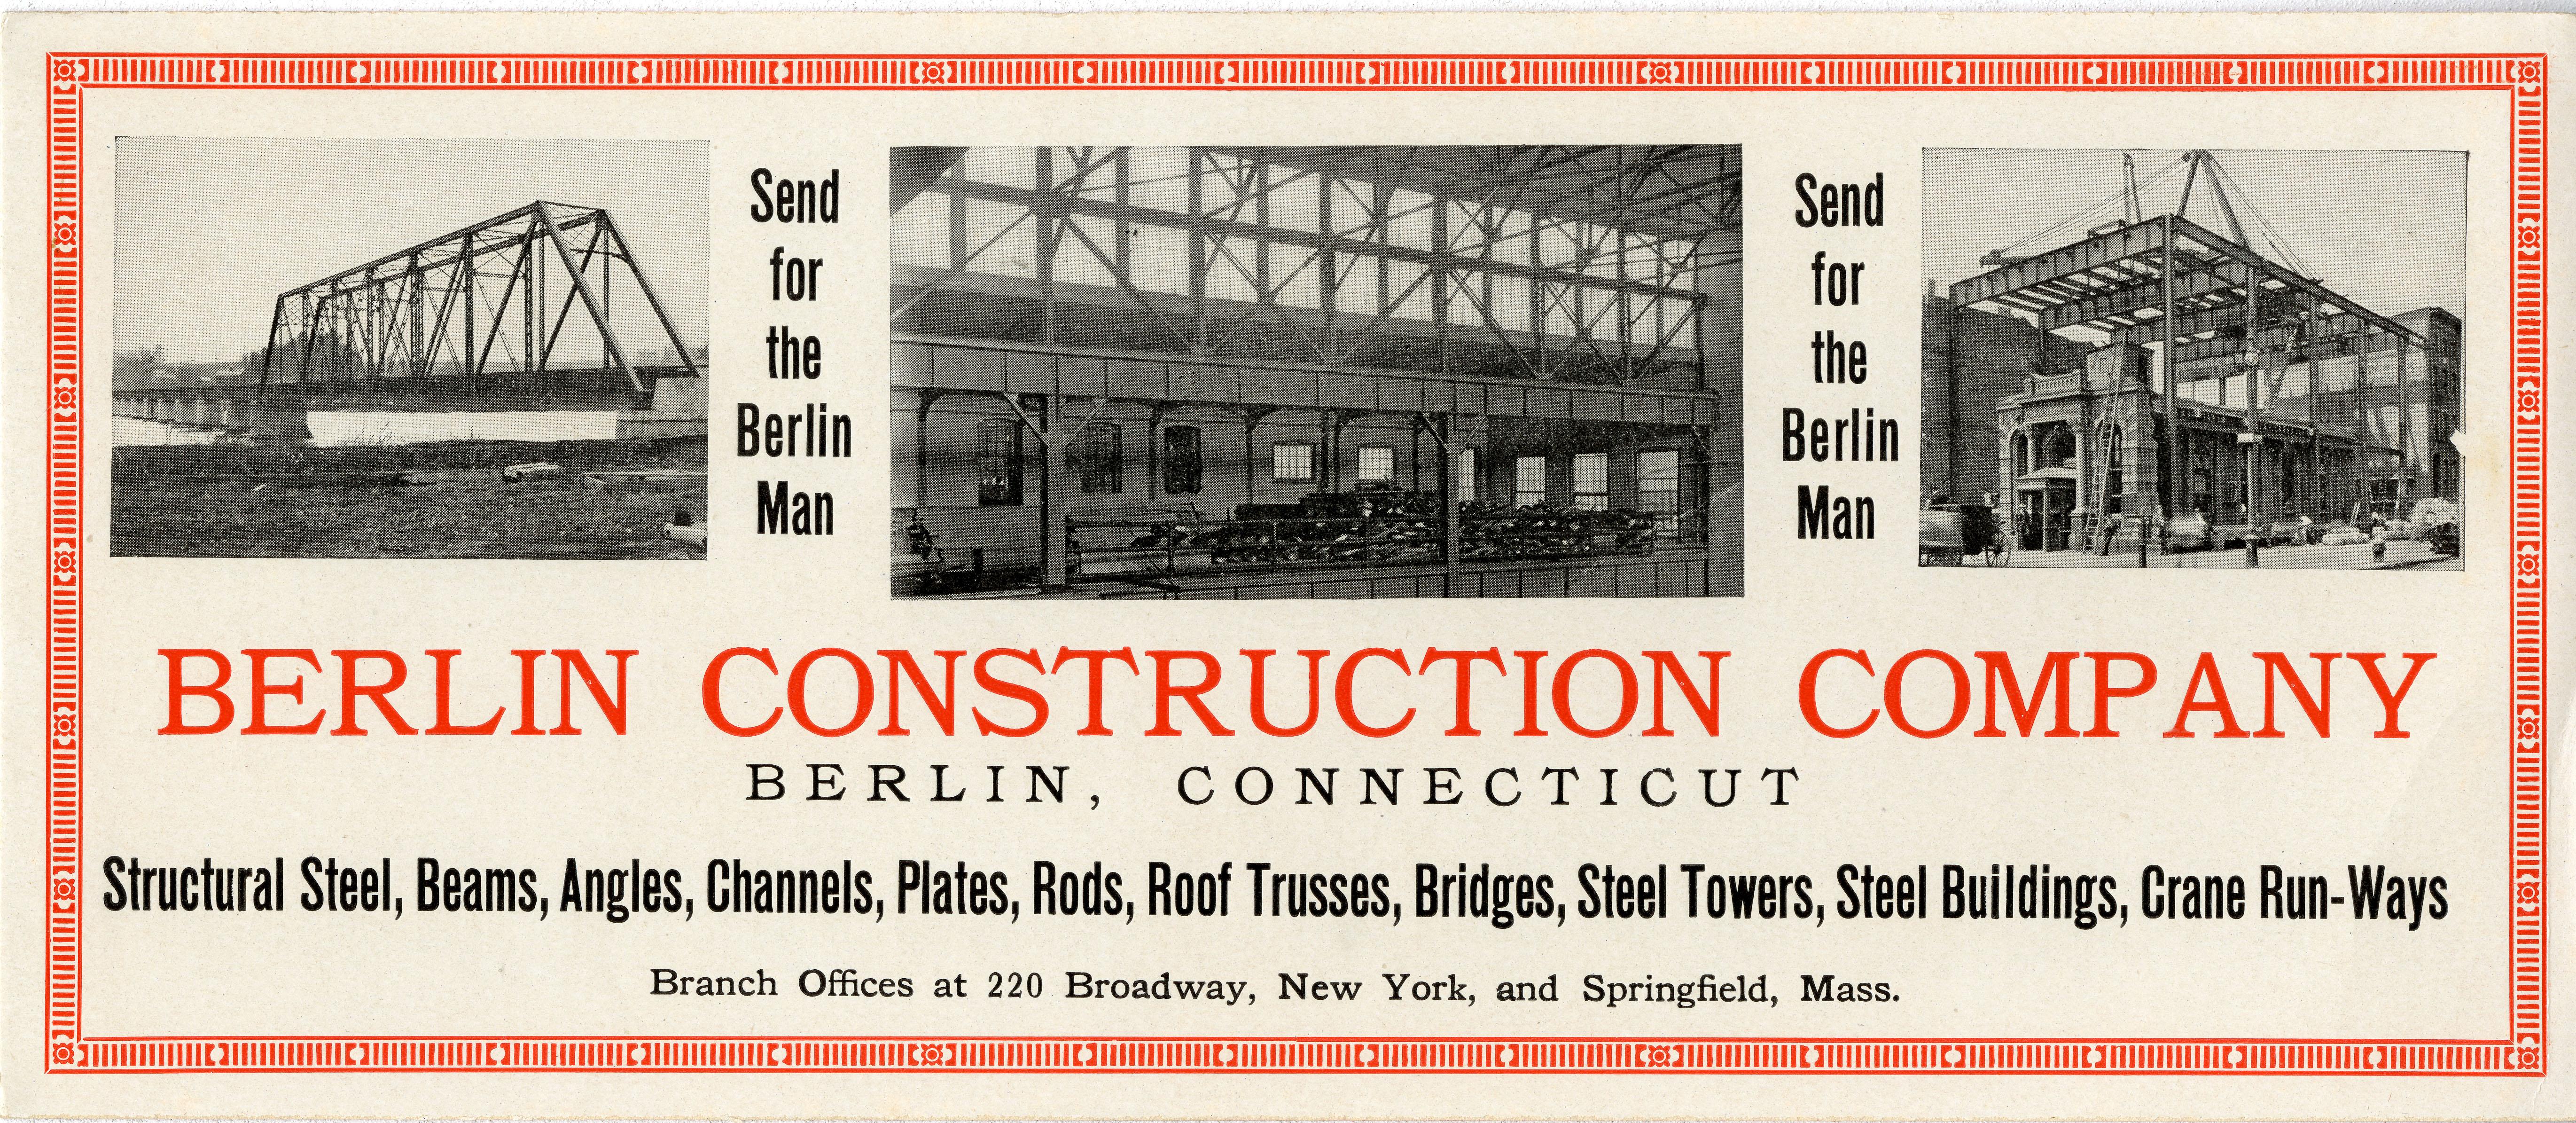 Berlin Construction Company advertising card, undated.